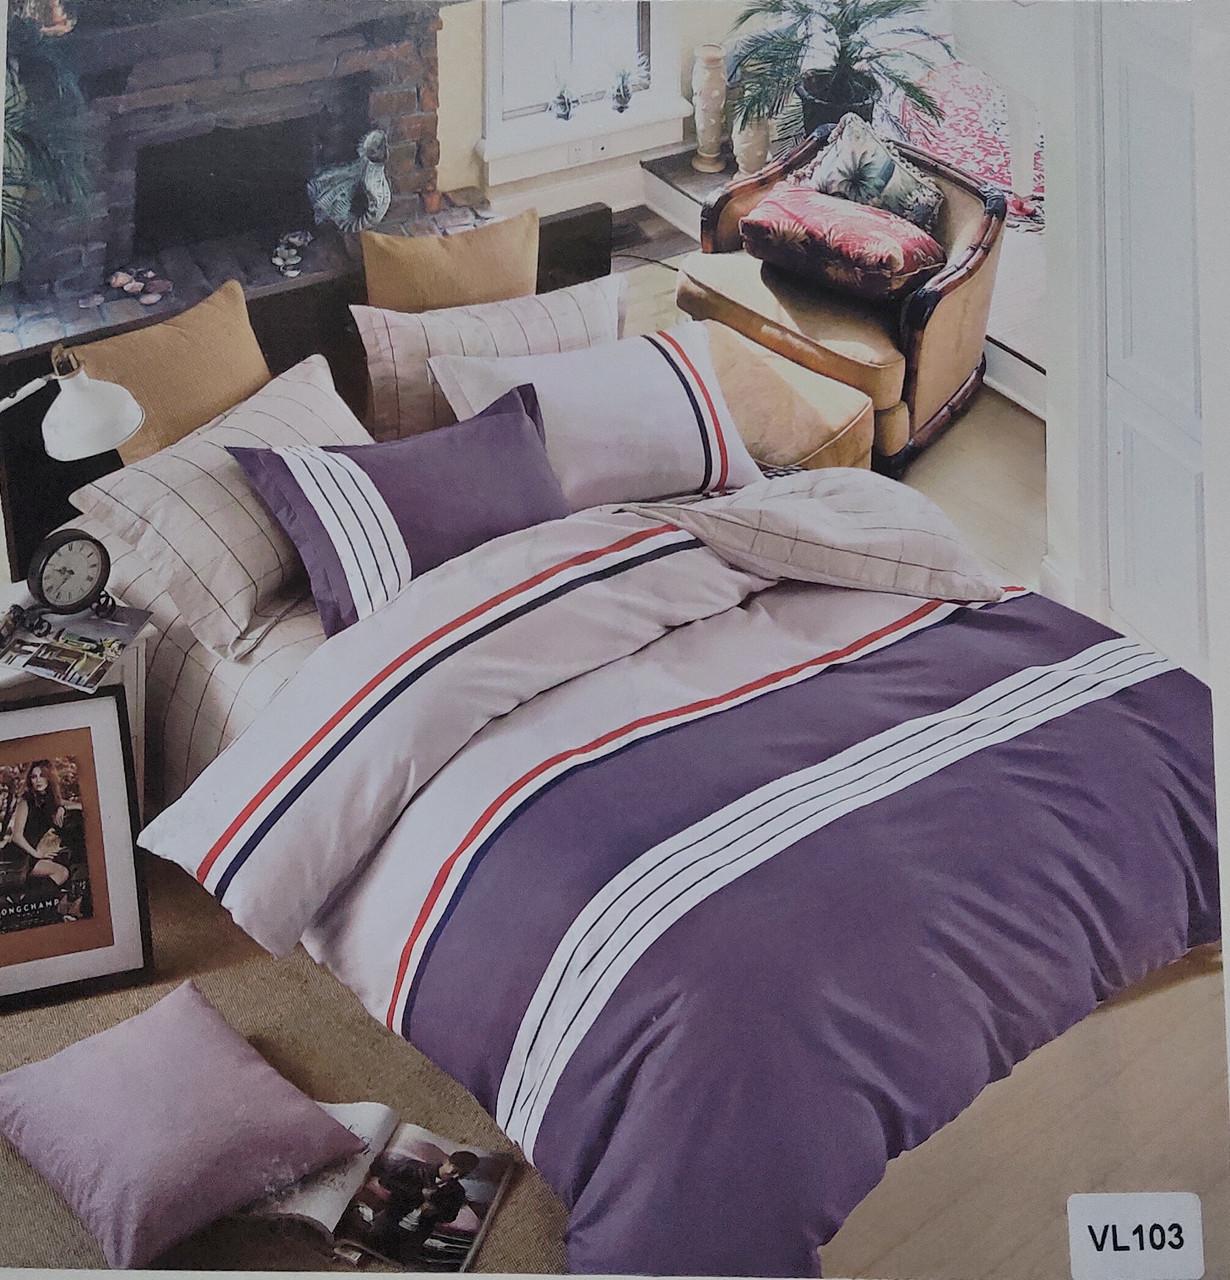 Комплект постельного белья микровелюр Vie Nouvelle Velour 200х220  VL103 Евро